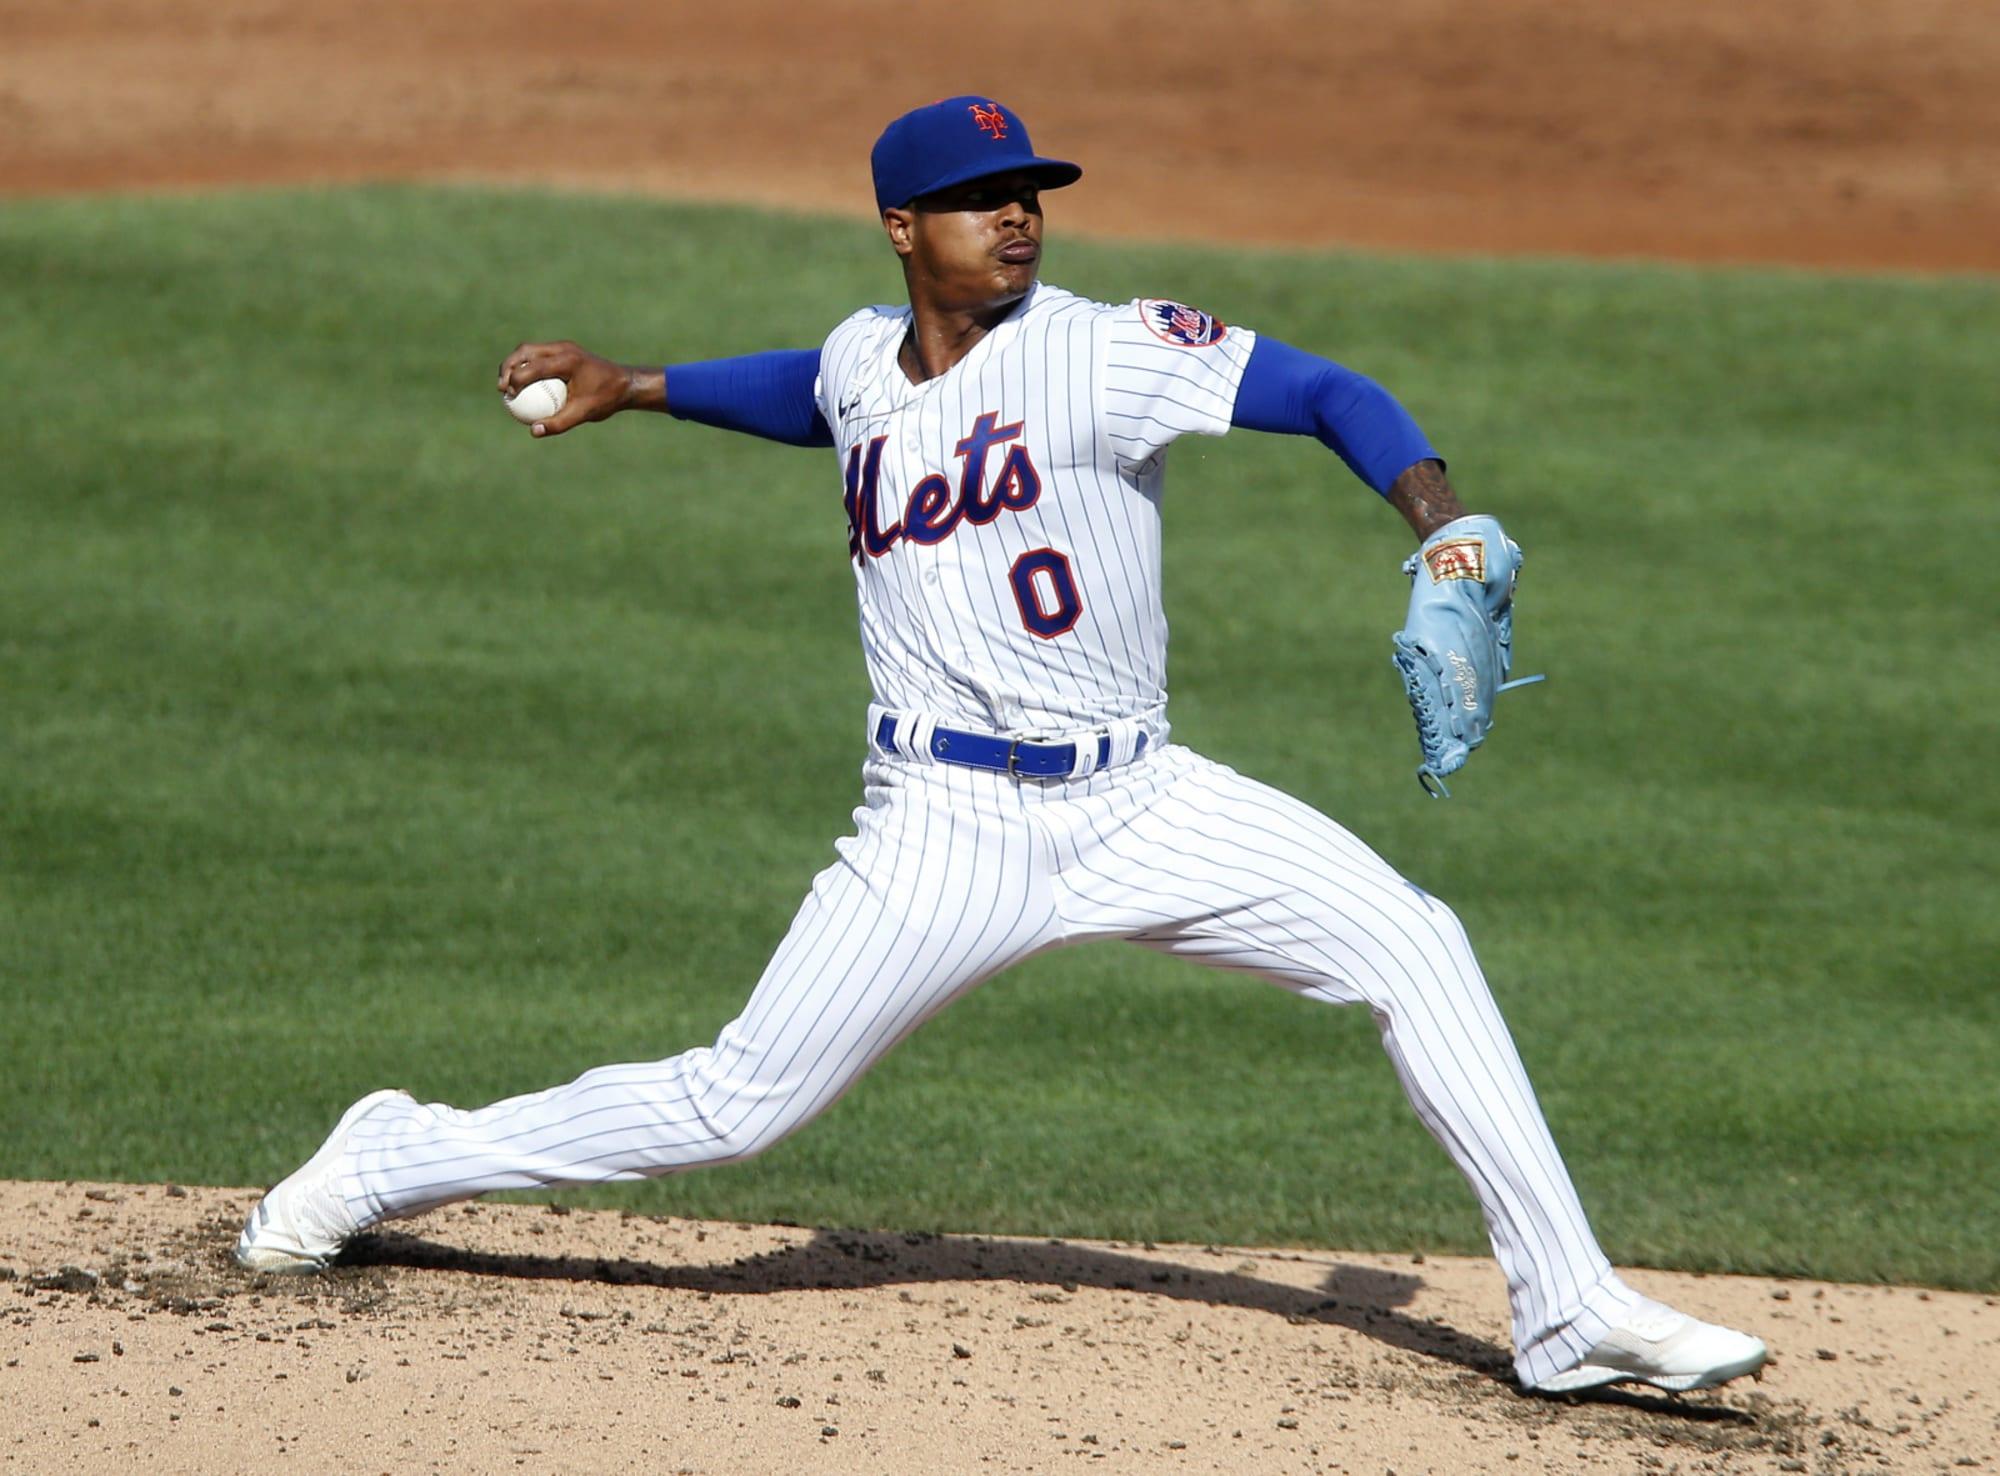 Duke baseball: New York Mets pitcher Marcus Storman opts out of season